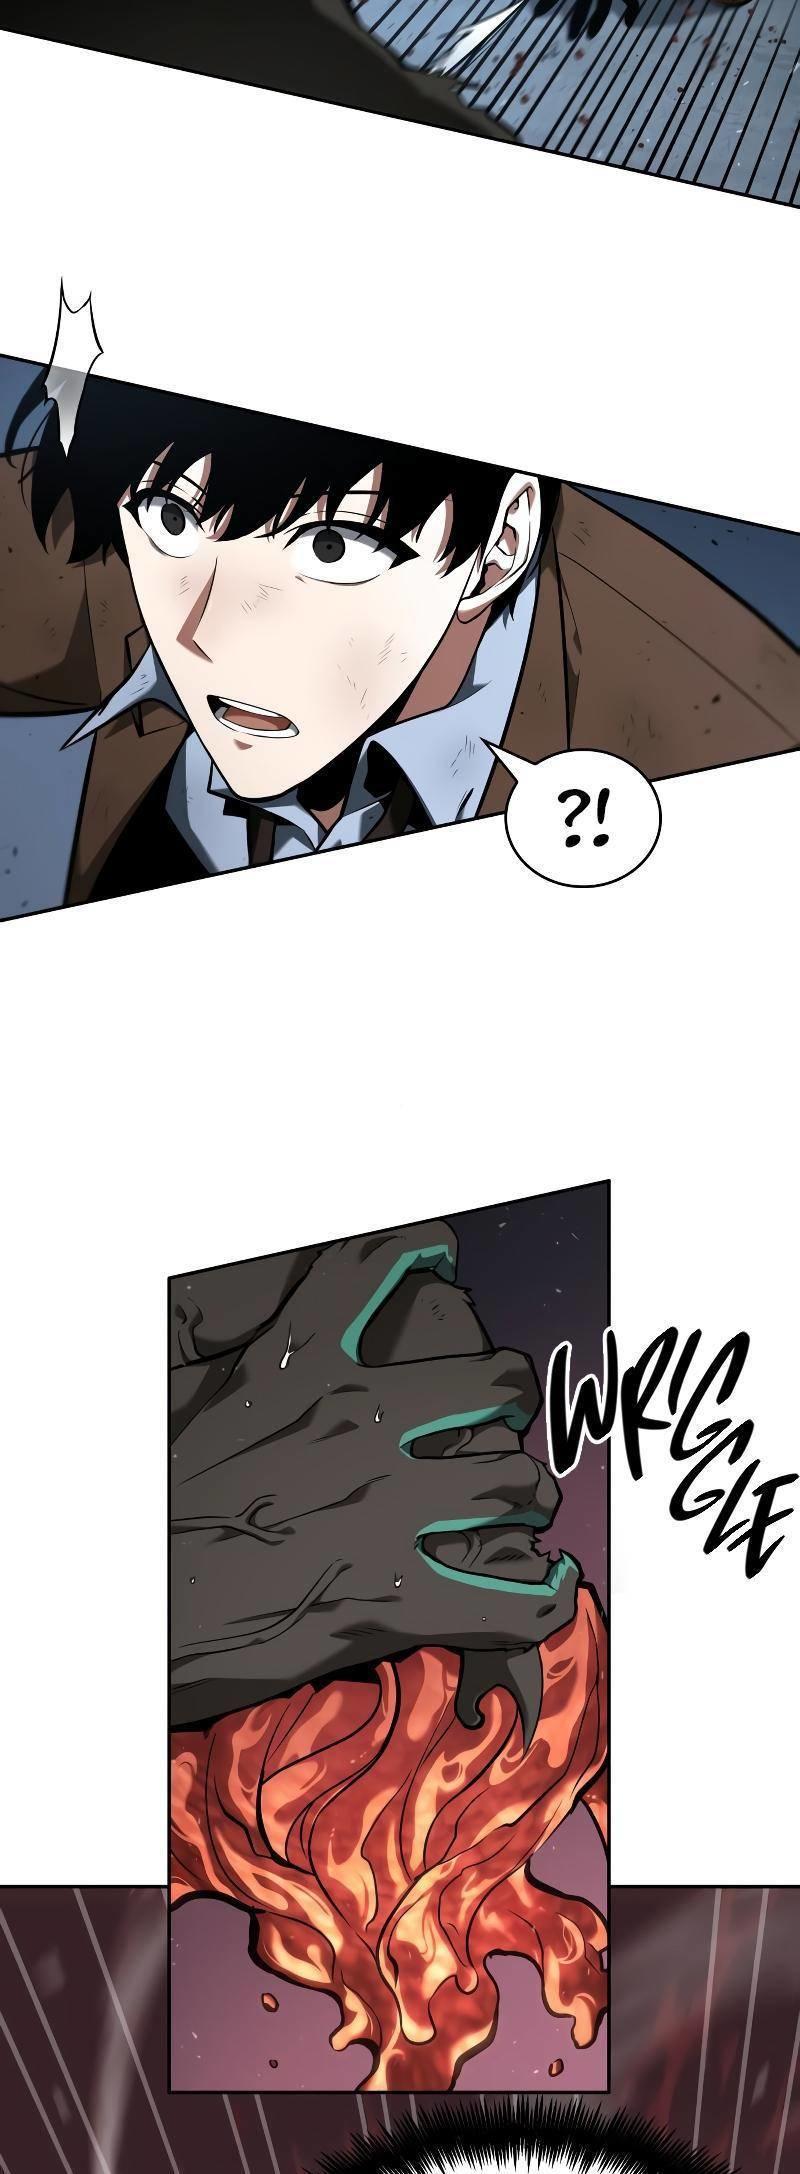 Omniscient Reader'S Viewpoint Chapter 72 page 4 - Mangakakalot